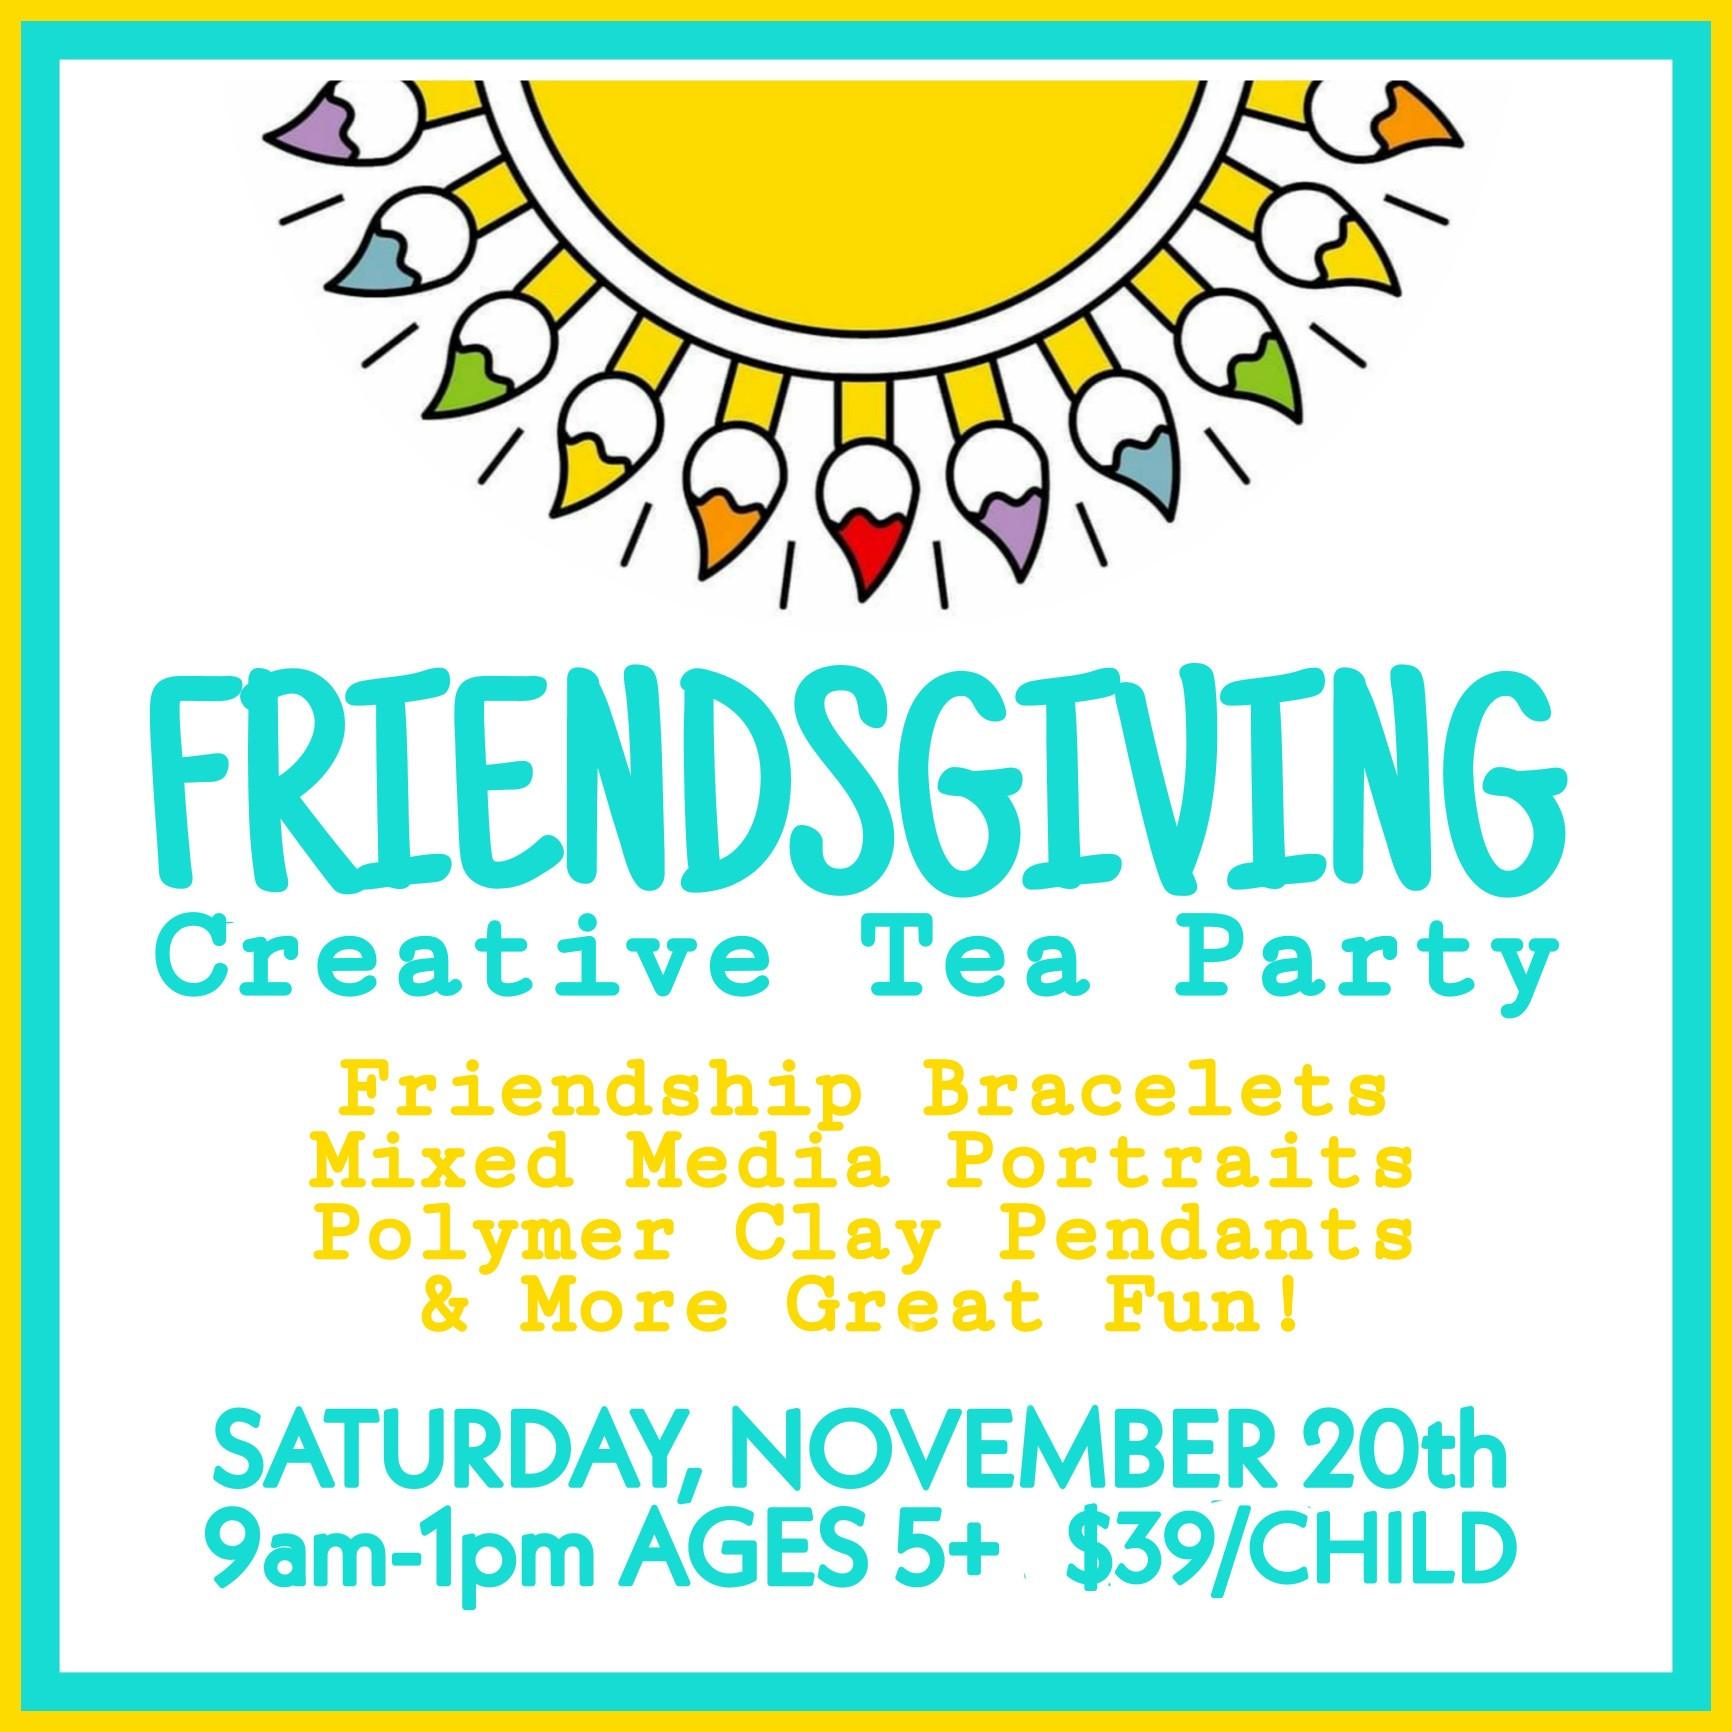 Friendsgiving Creative Tea Party